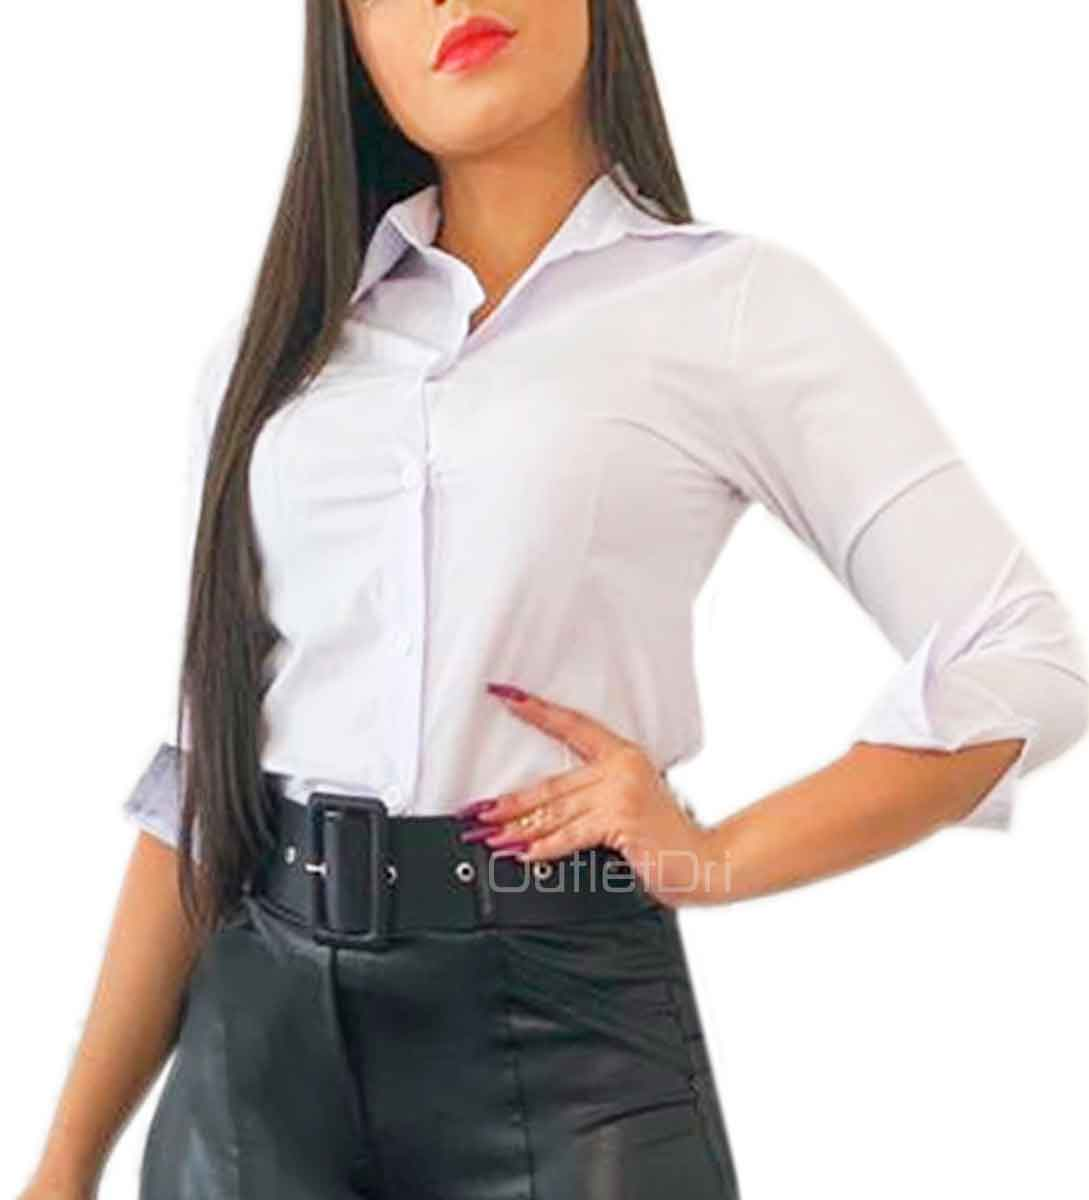 Camisa Camisete Feminino Manga 3/4 Liso Branco